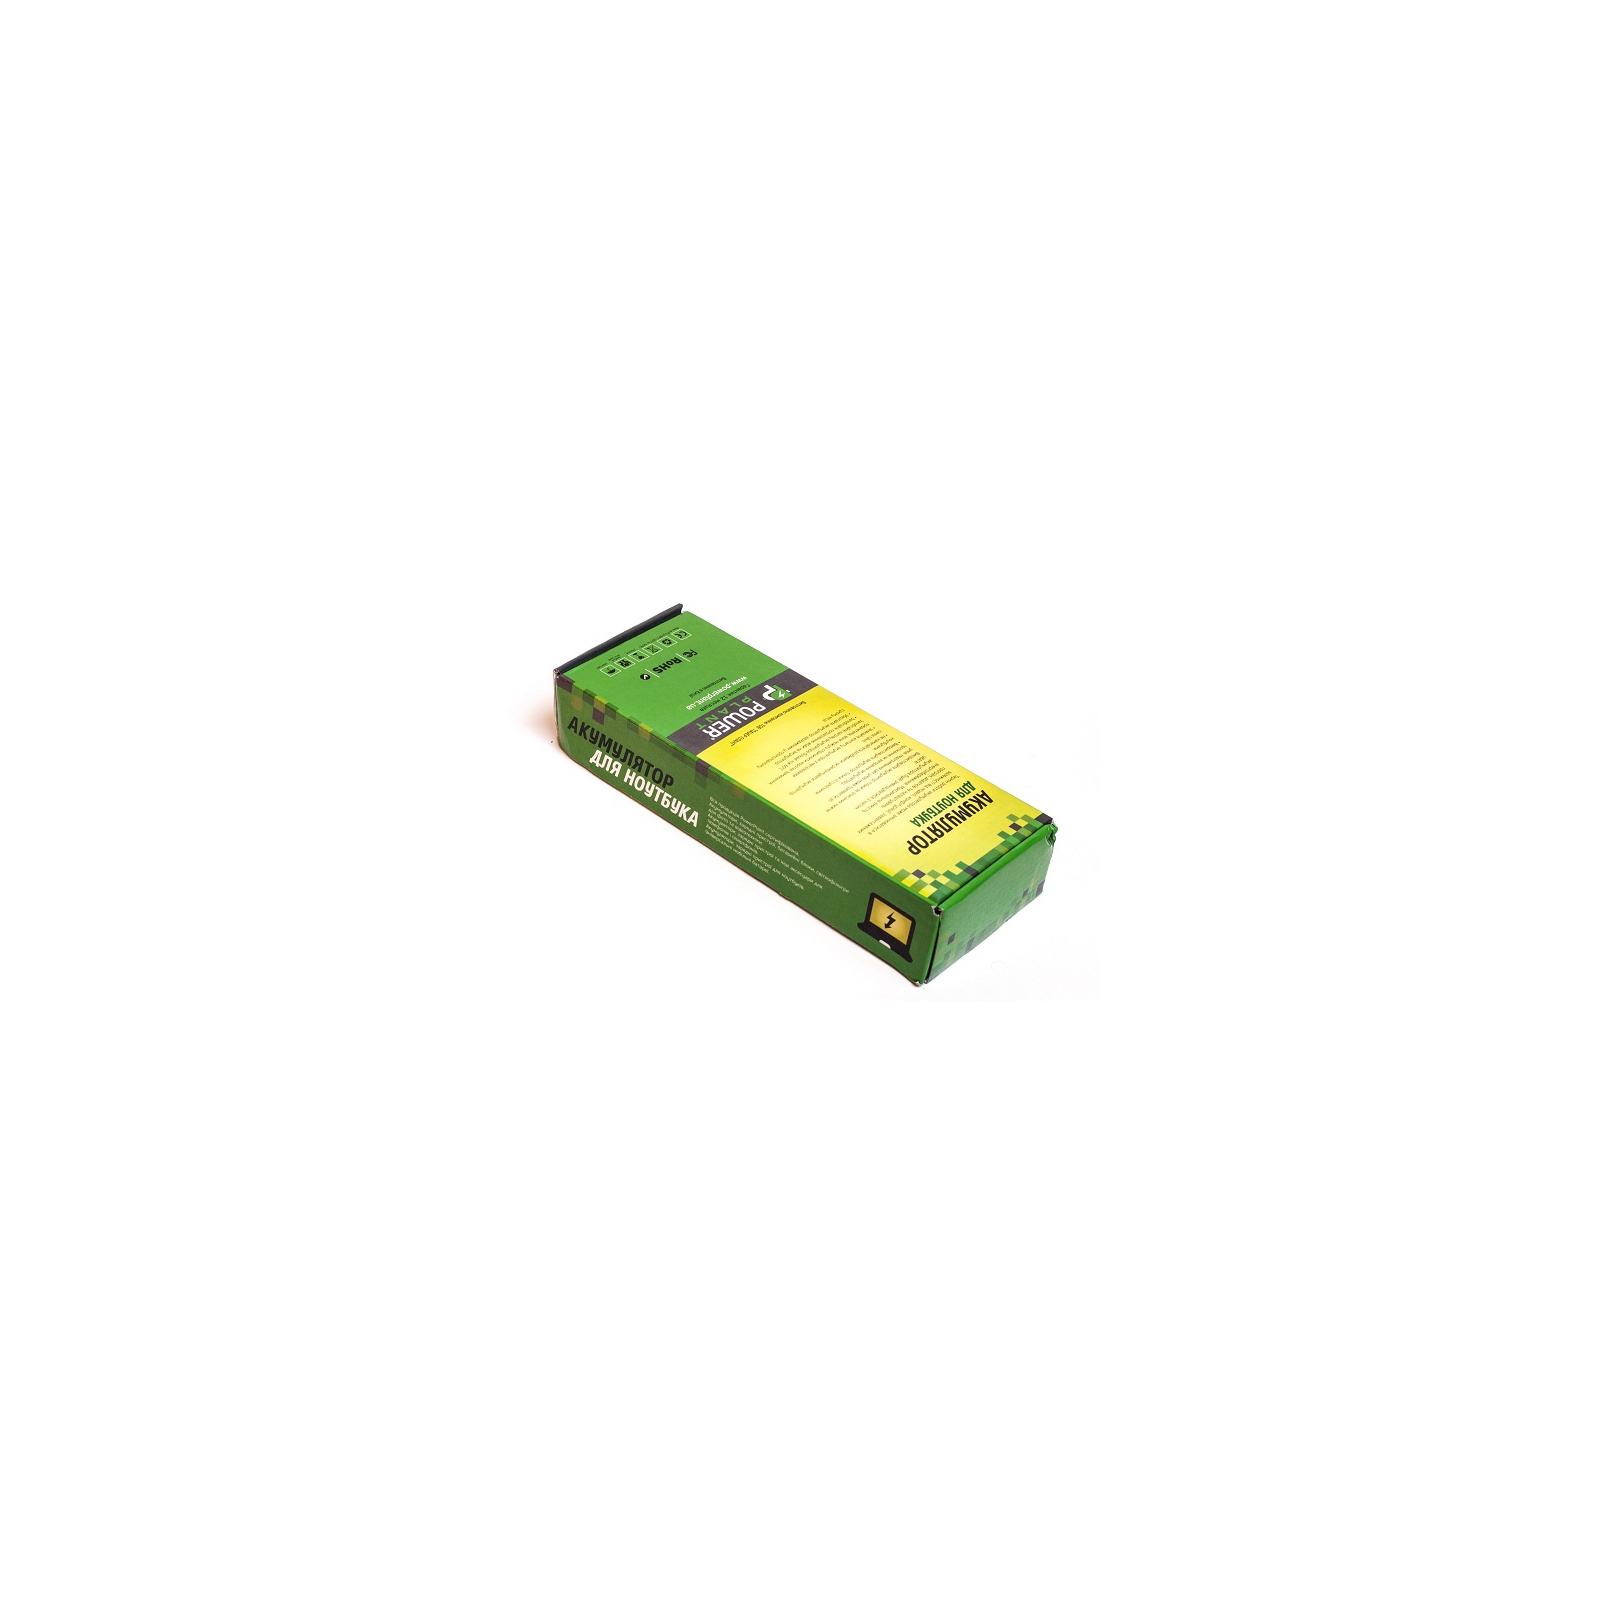 Аккумулятор для ноутбука ASUS EEE PC105 (A32-1015, AS1015LH) 10,8V 4400mAh PowerPlant (NB00000289) изображение 2